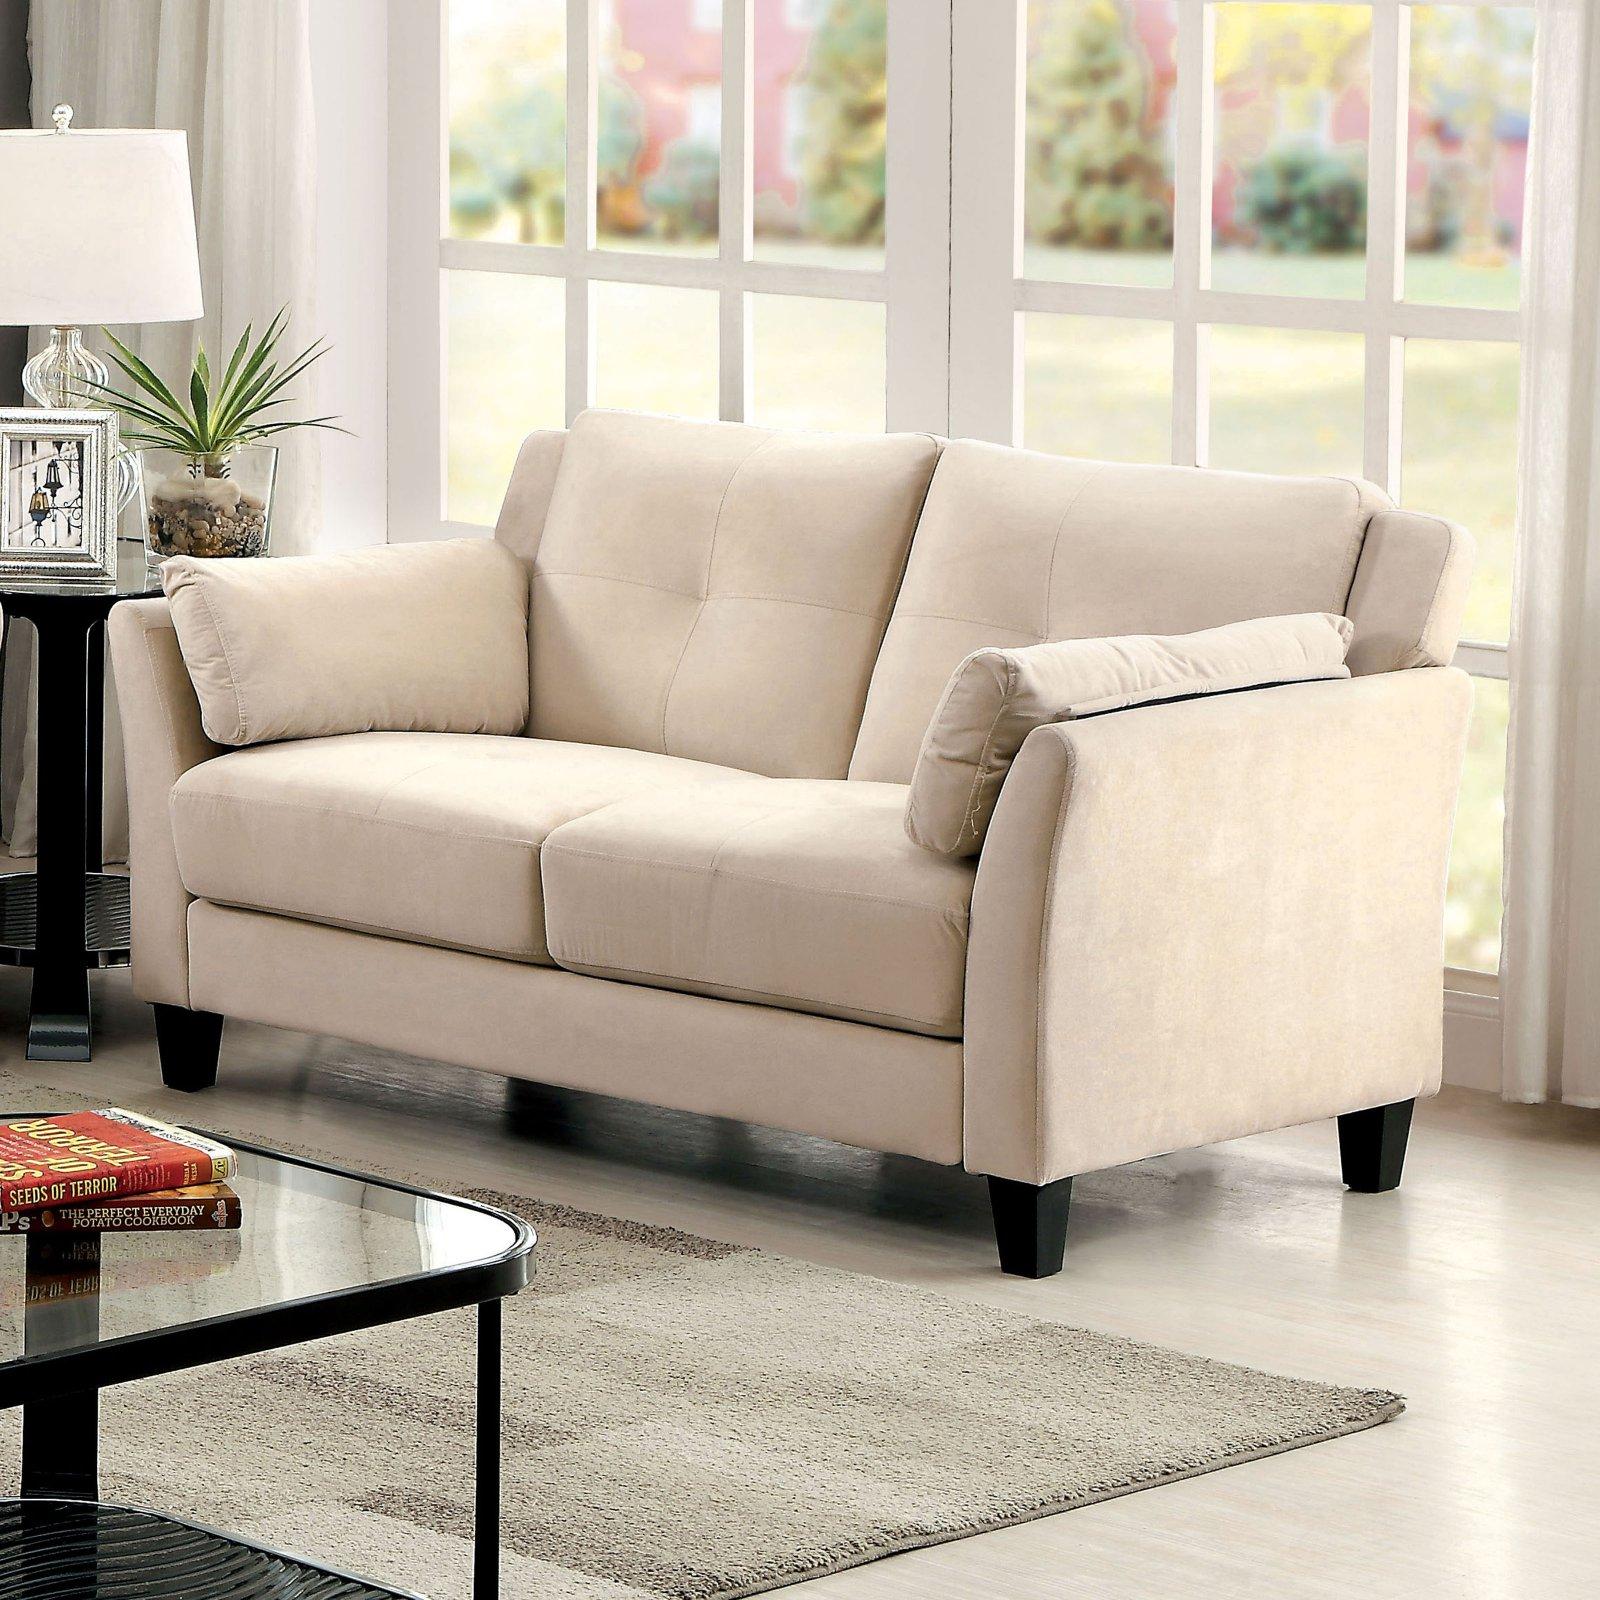 Furniture of America Galvan Loveseat